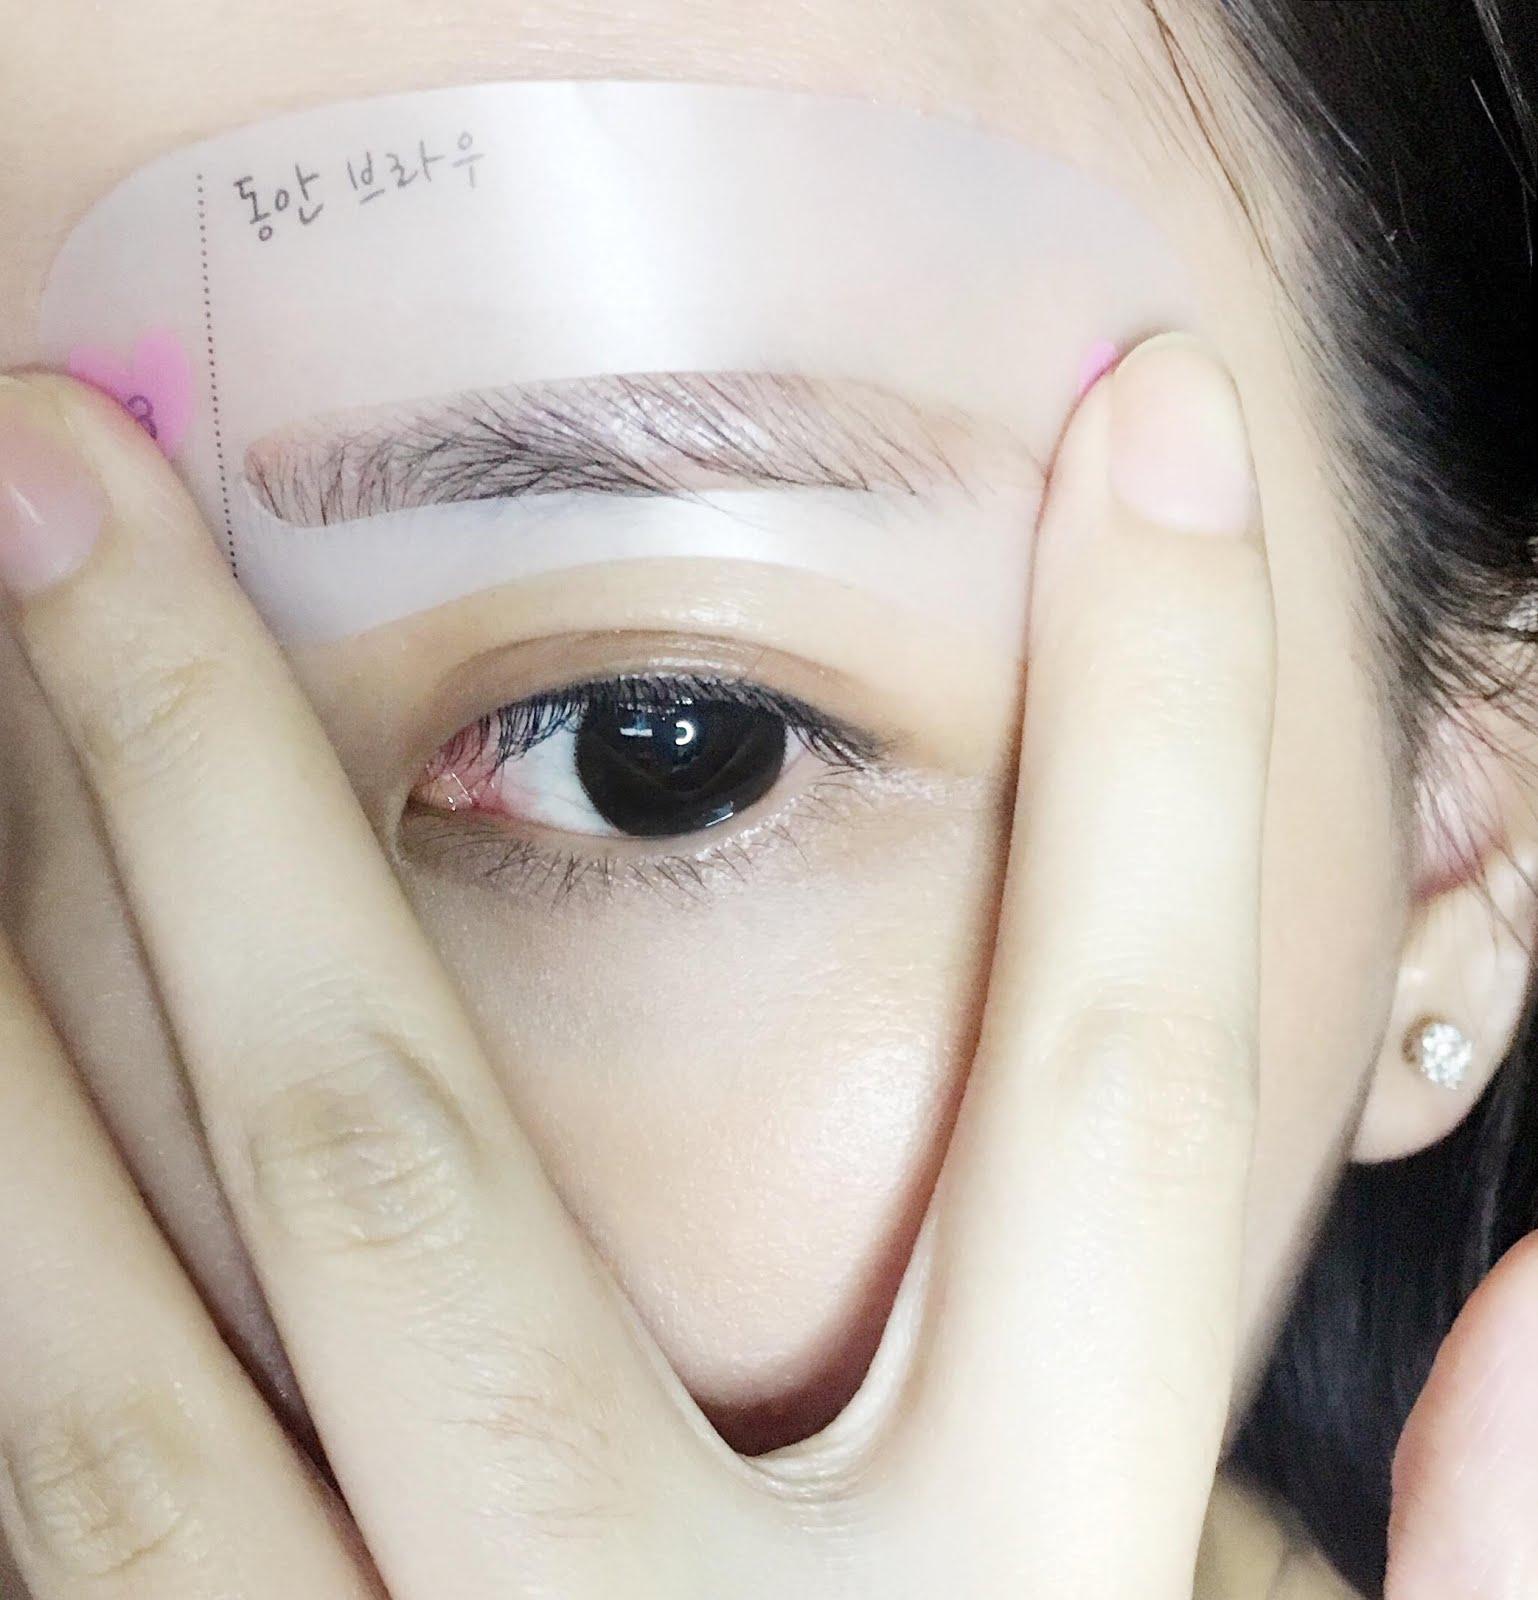 Secret Key Tattoo Eyebrow Tint Pack In 03 Choco Frappuccino